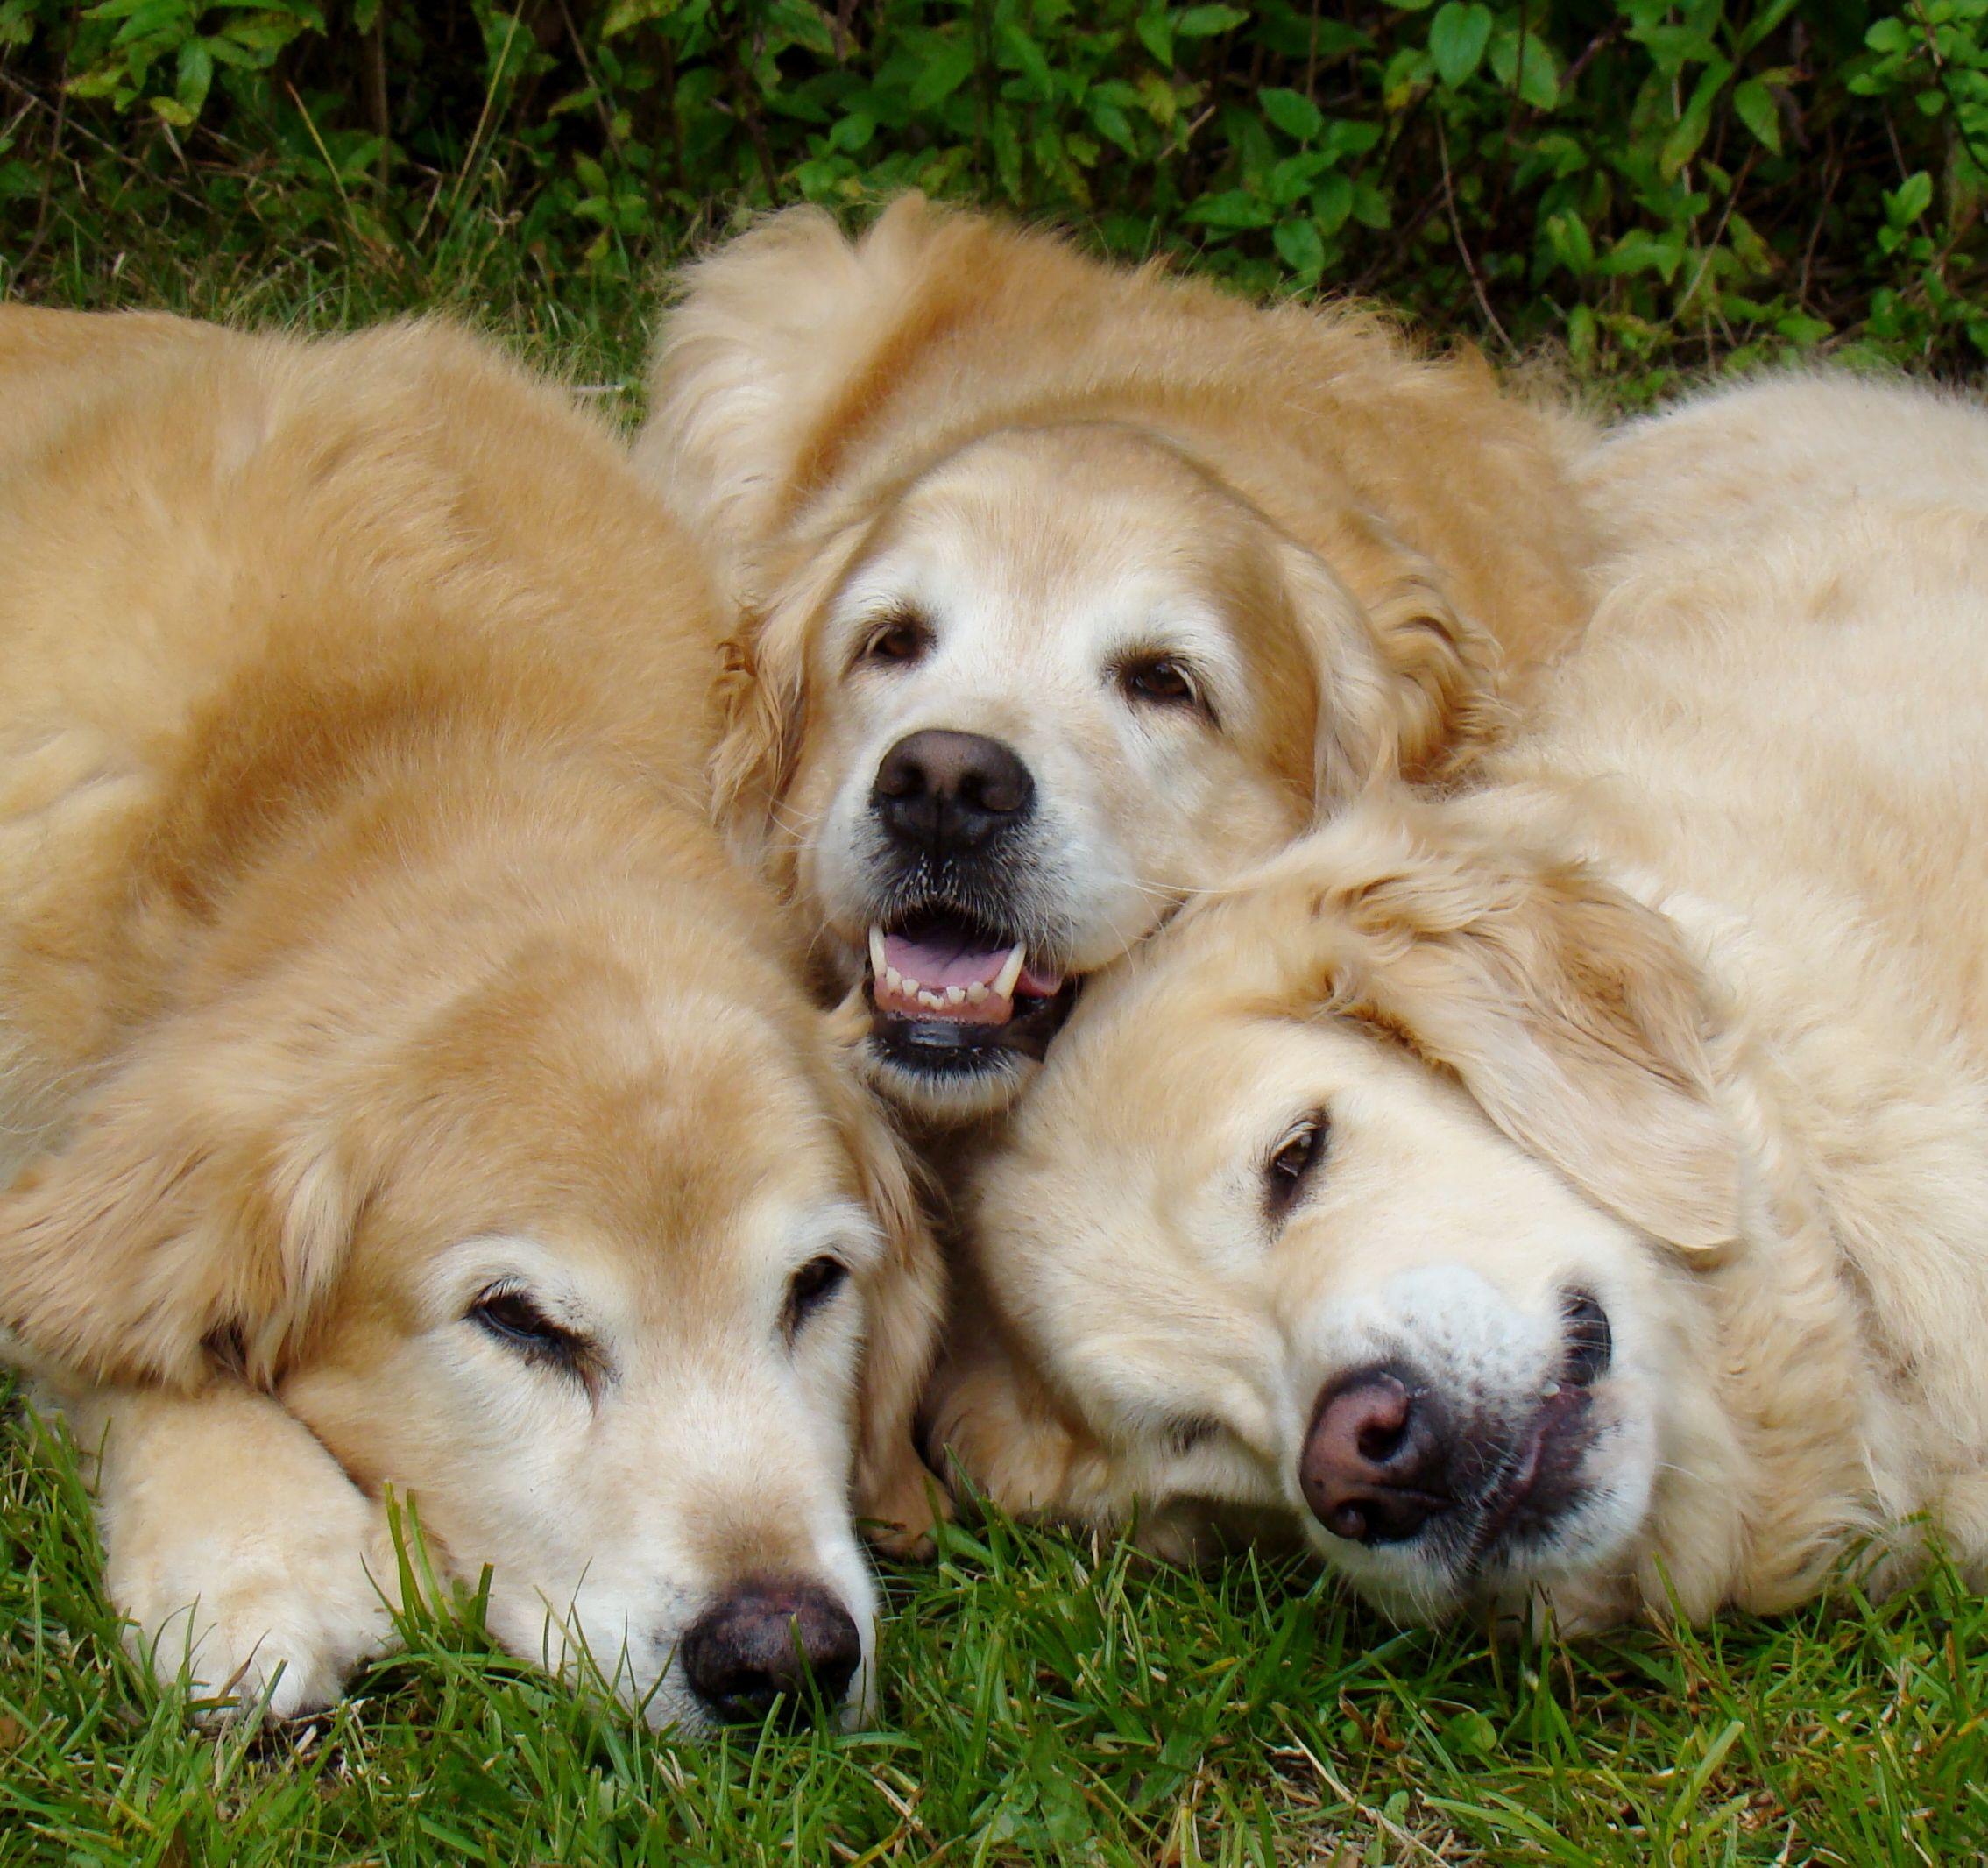 479 Best Bentley Images On Pinterest: Best Buddies Tyler, Brie And Bentley